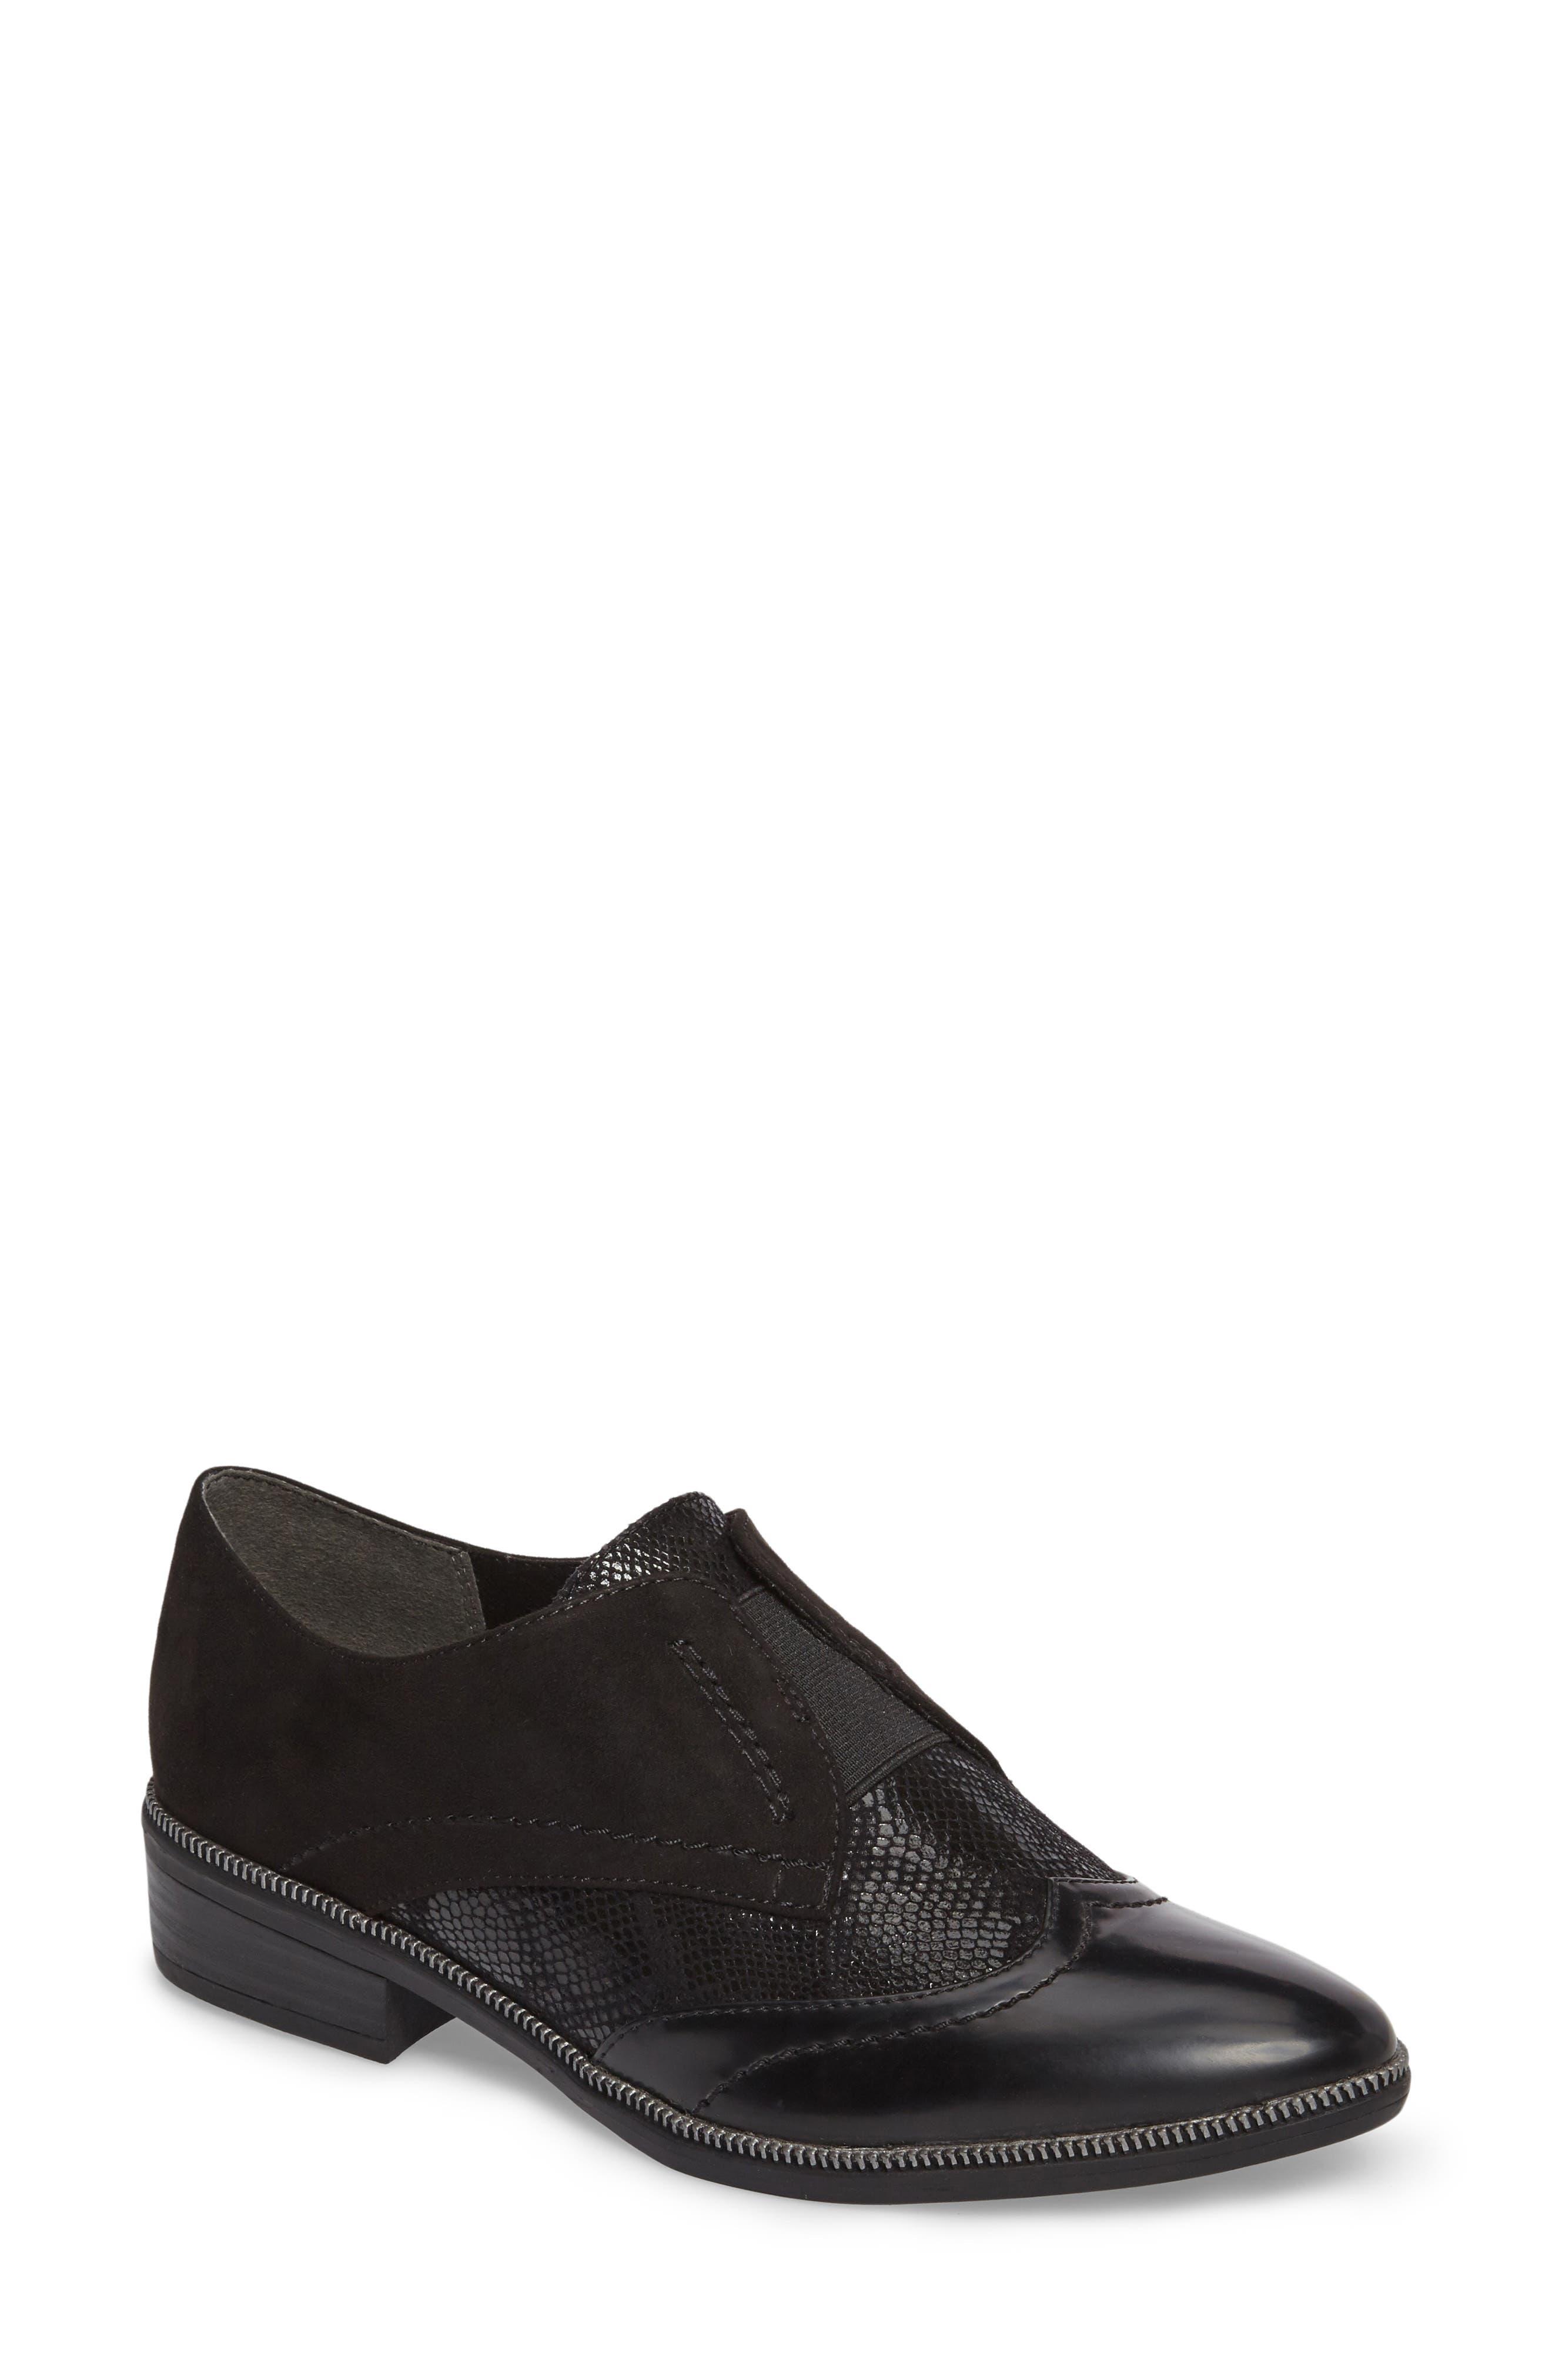 'Phanie' Slip-On Oxford,                         Main,                         color, Black Fabric